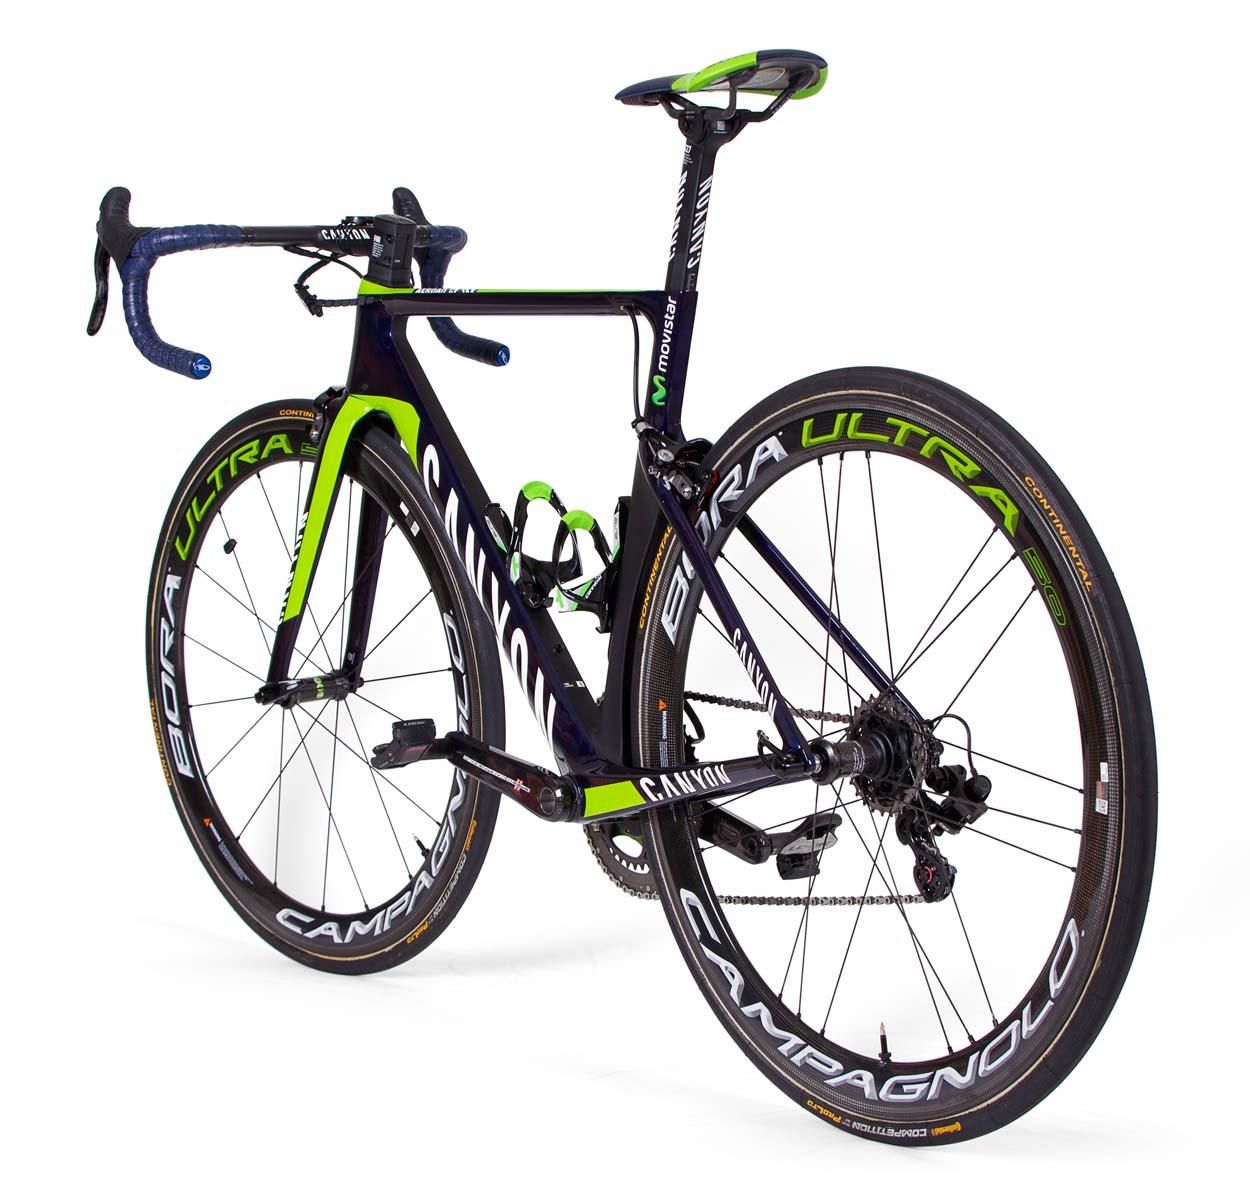 Team bike gallery – Canyon of Movistar - Ride Media